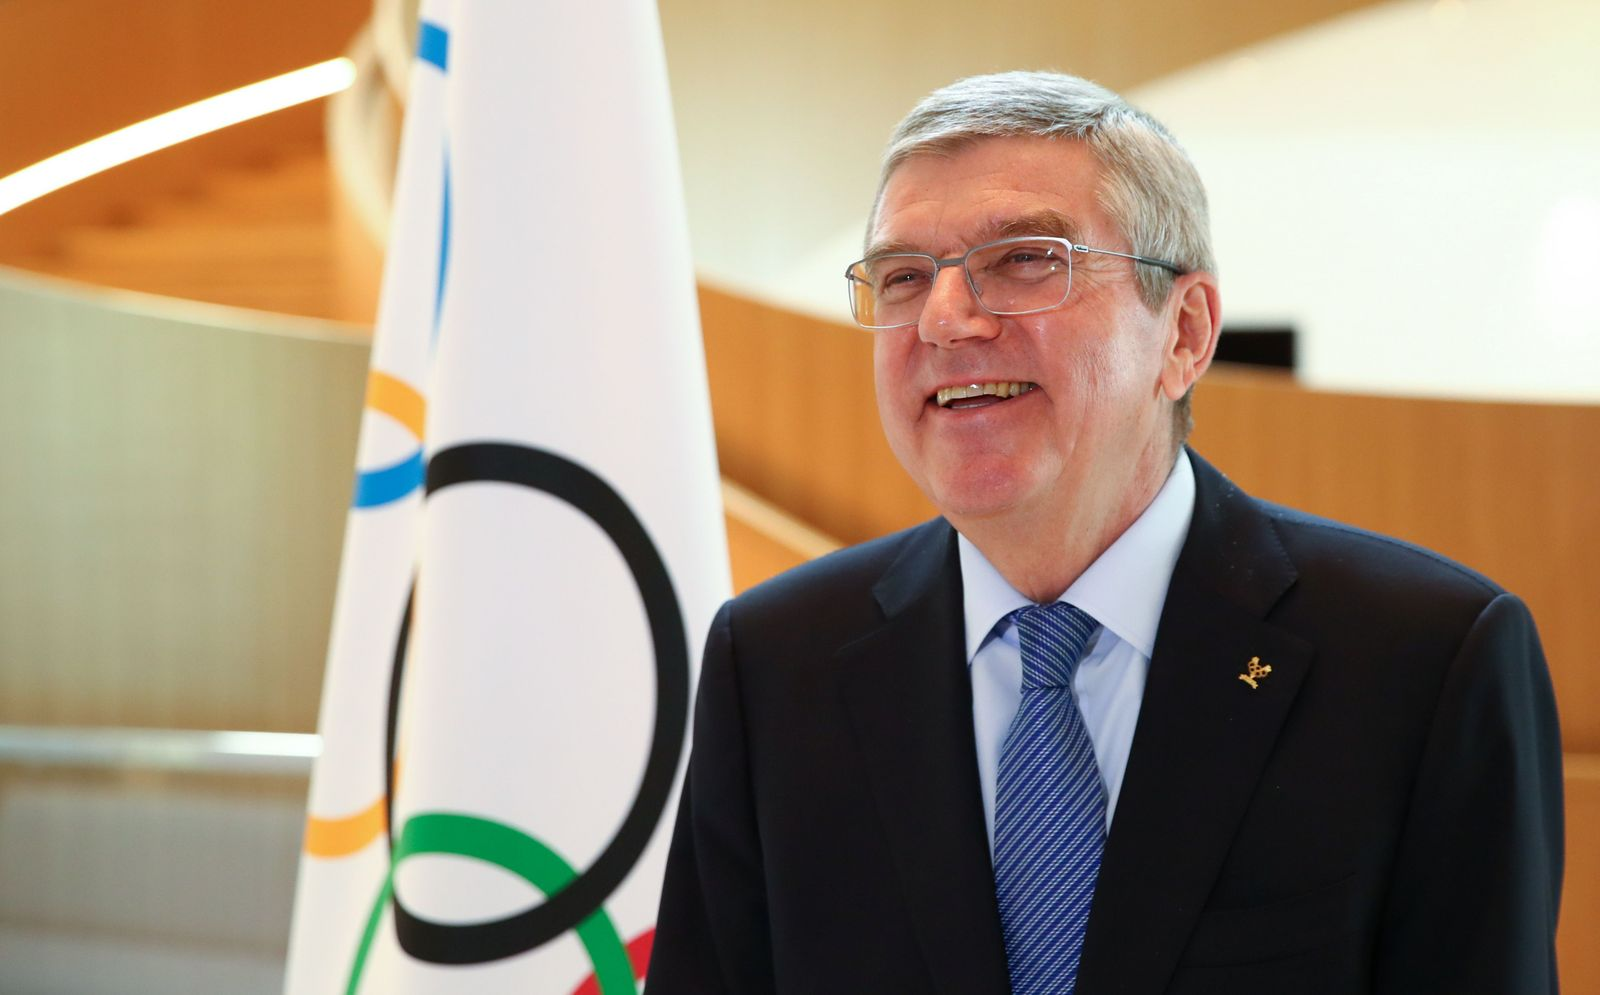 Interview with IOC President Bach after Tokyo 2020 postponement decision, Lausanne, Switzerland - 25 Mar 2020